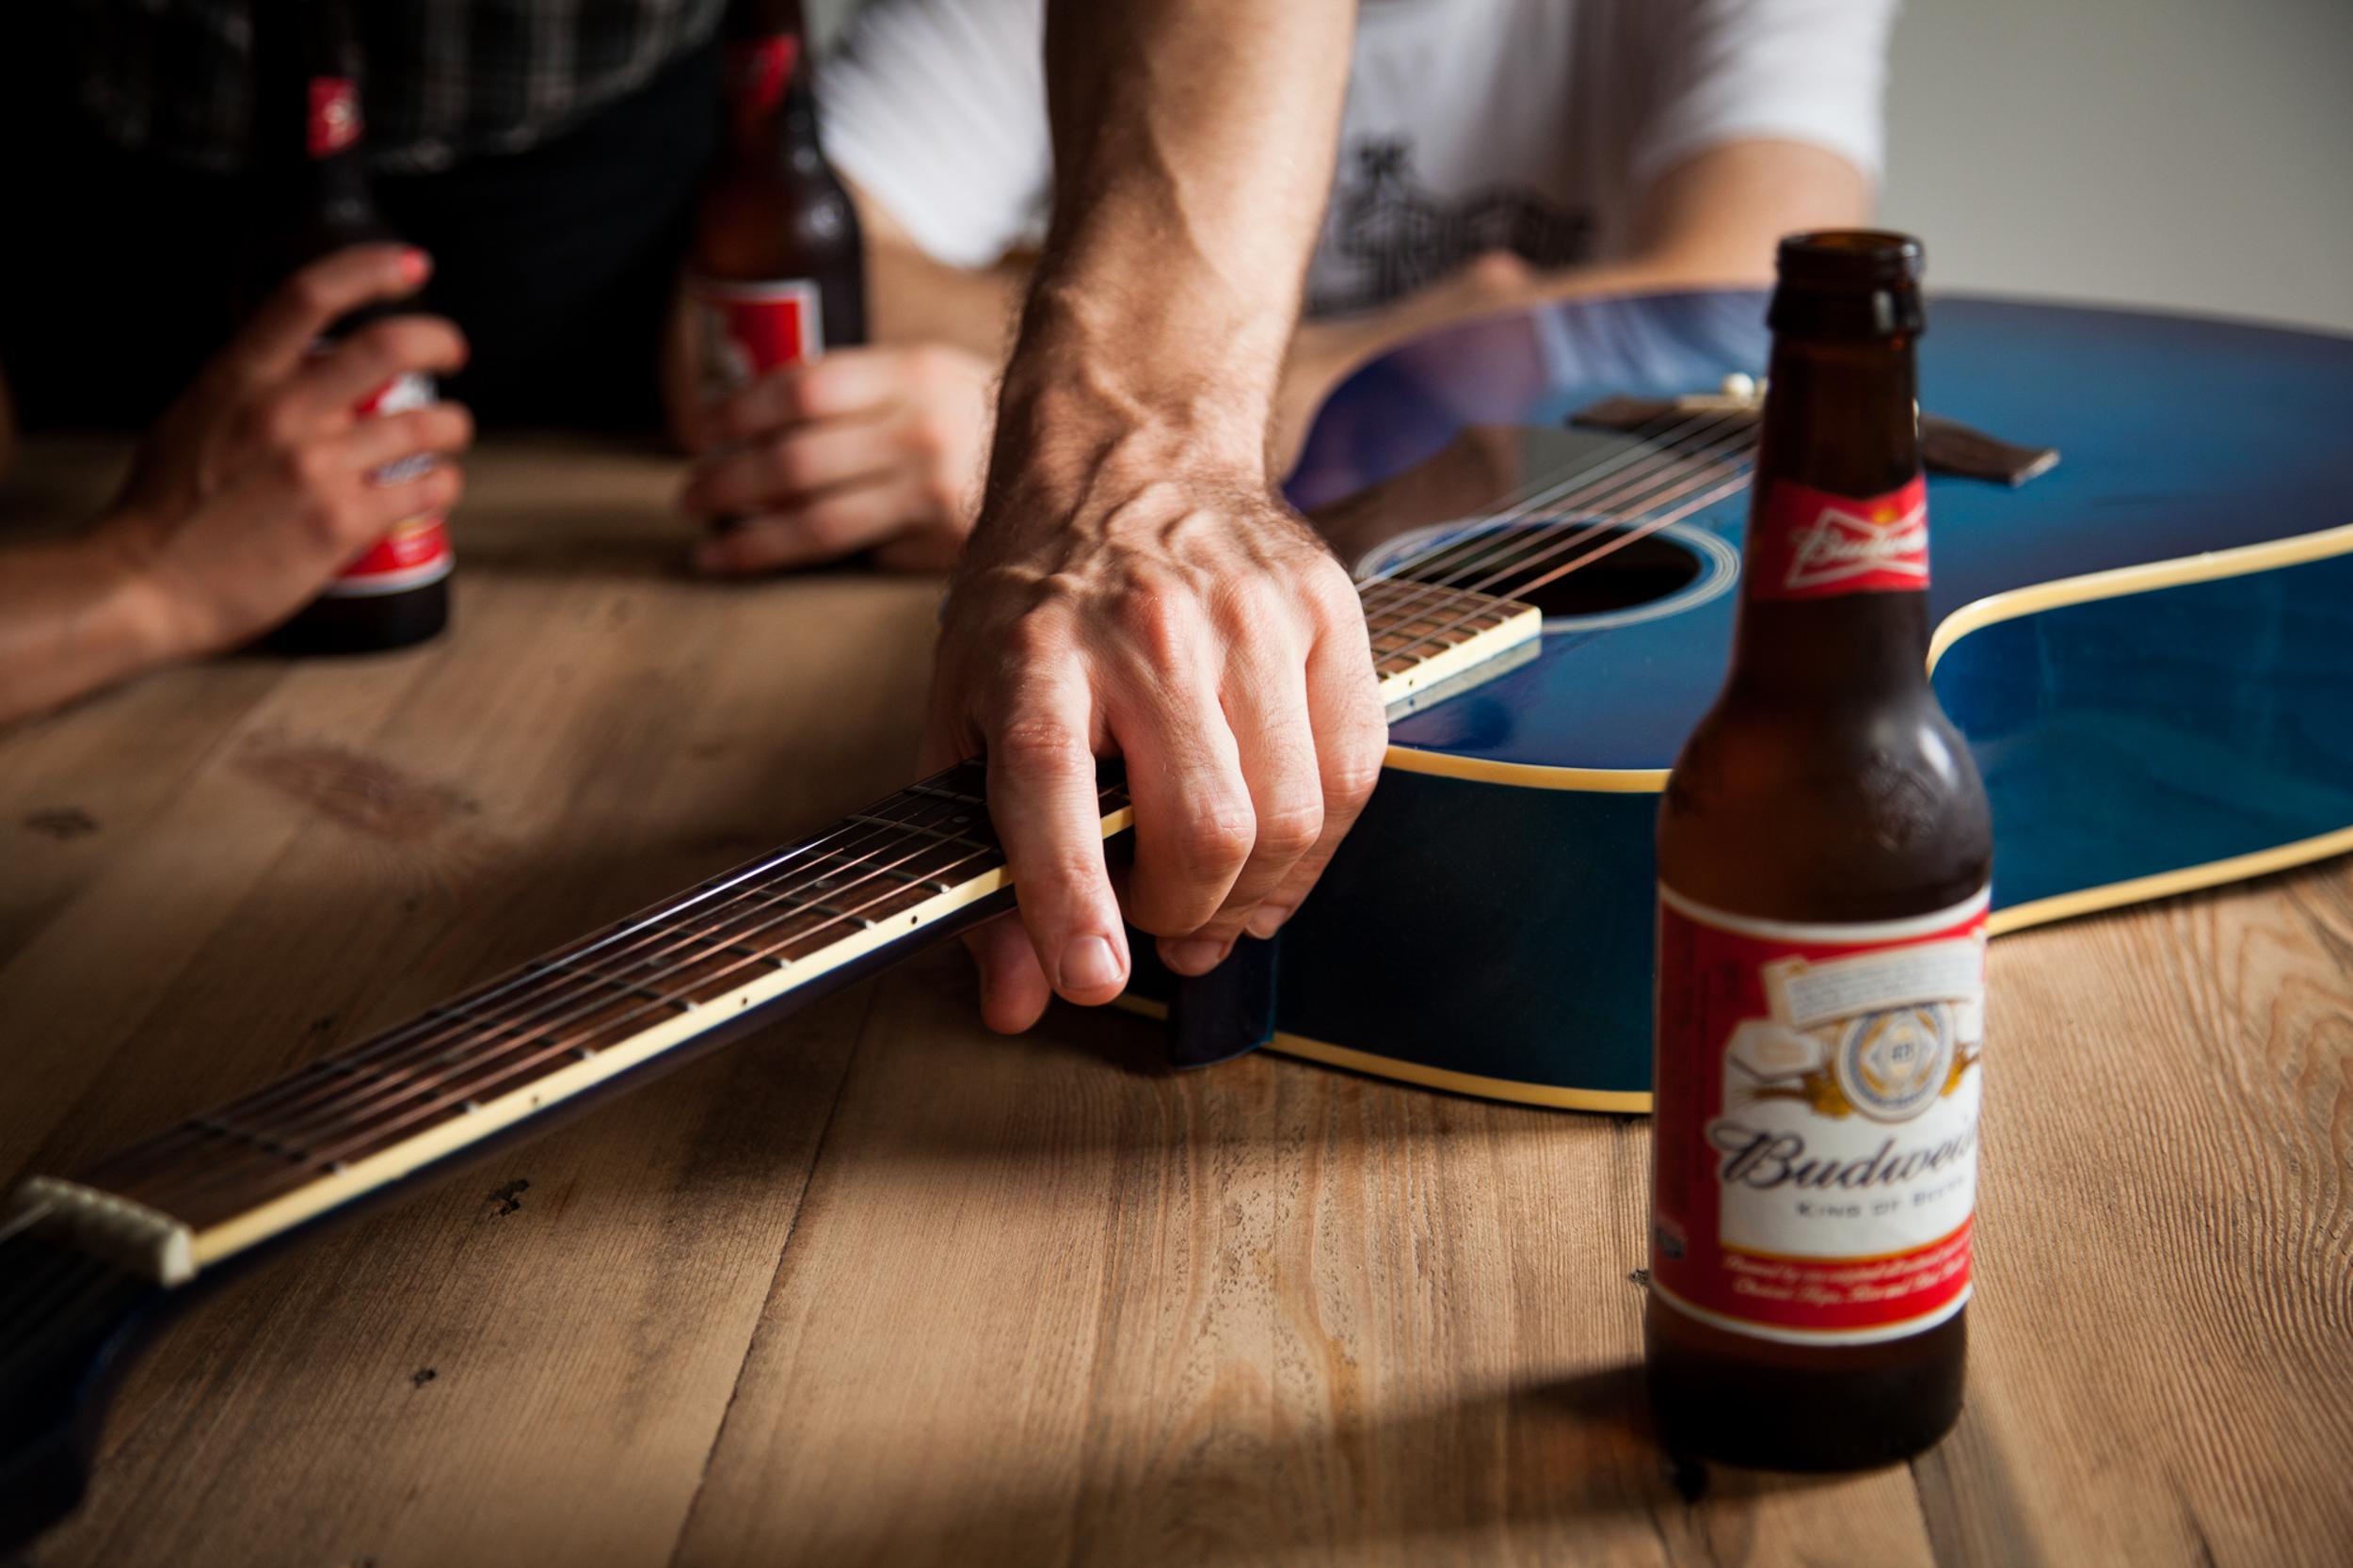 Budweiser_2549.jpg